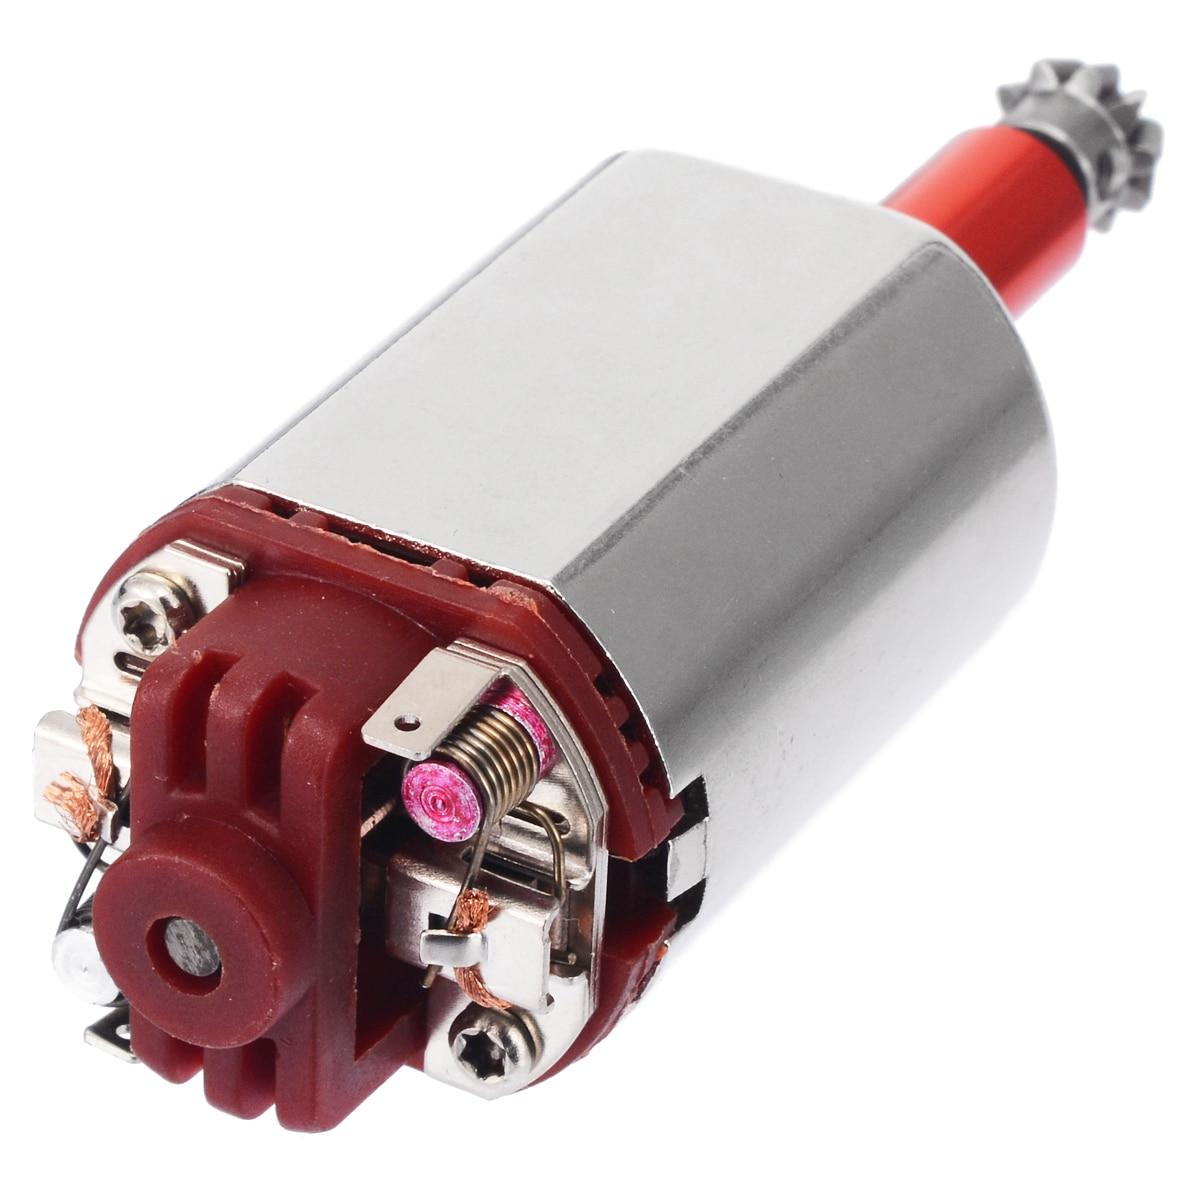 High Speed Motor Metal Motor 45000 RPM 470 Motor High Speed Torque For Jinming Gen9 M4A1 Gel Ball Blaster Mayitr